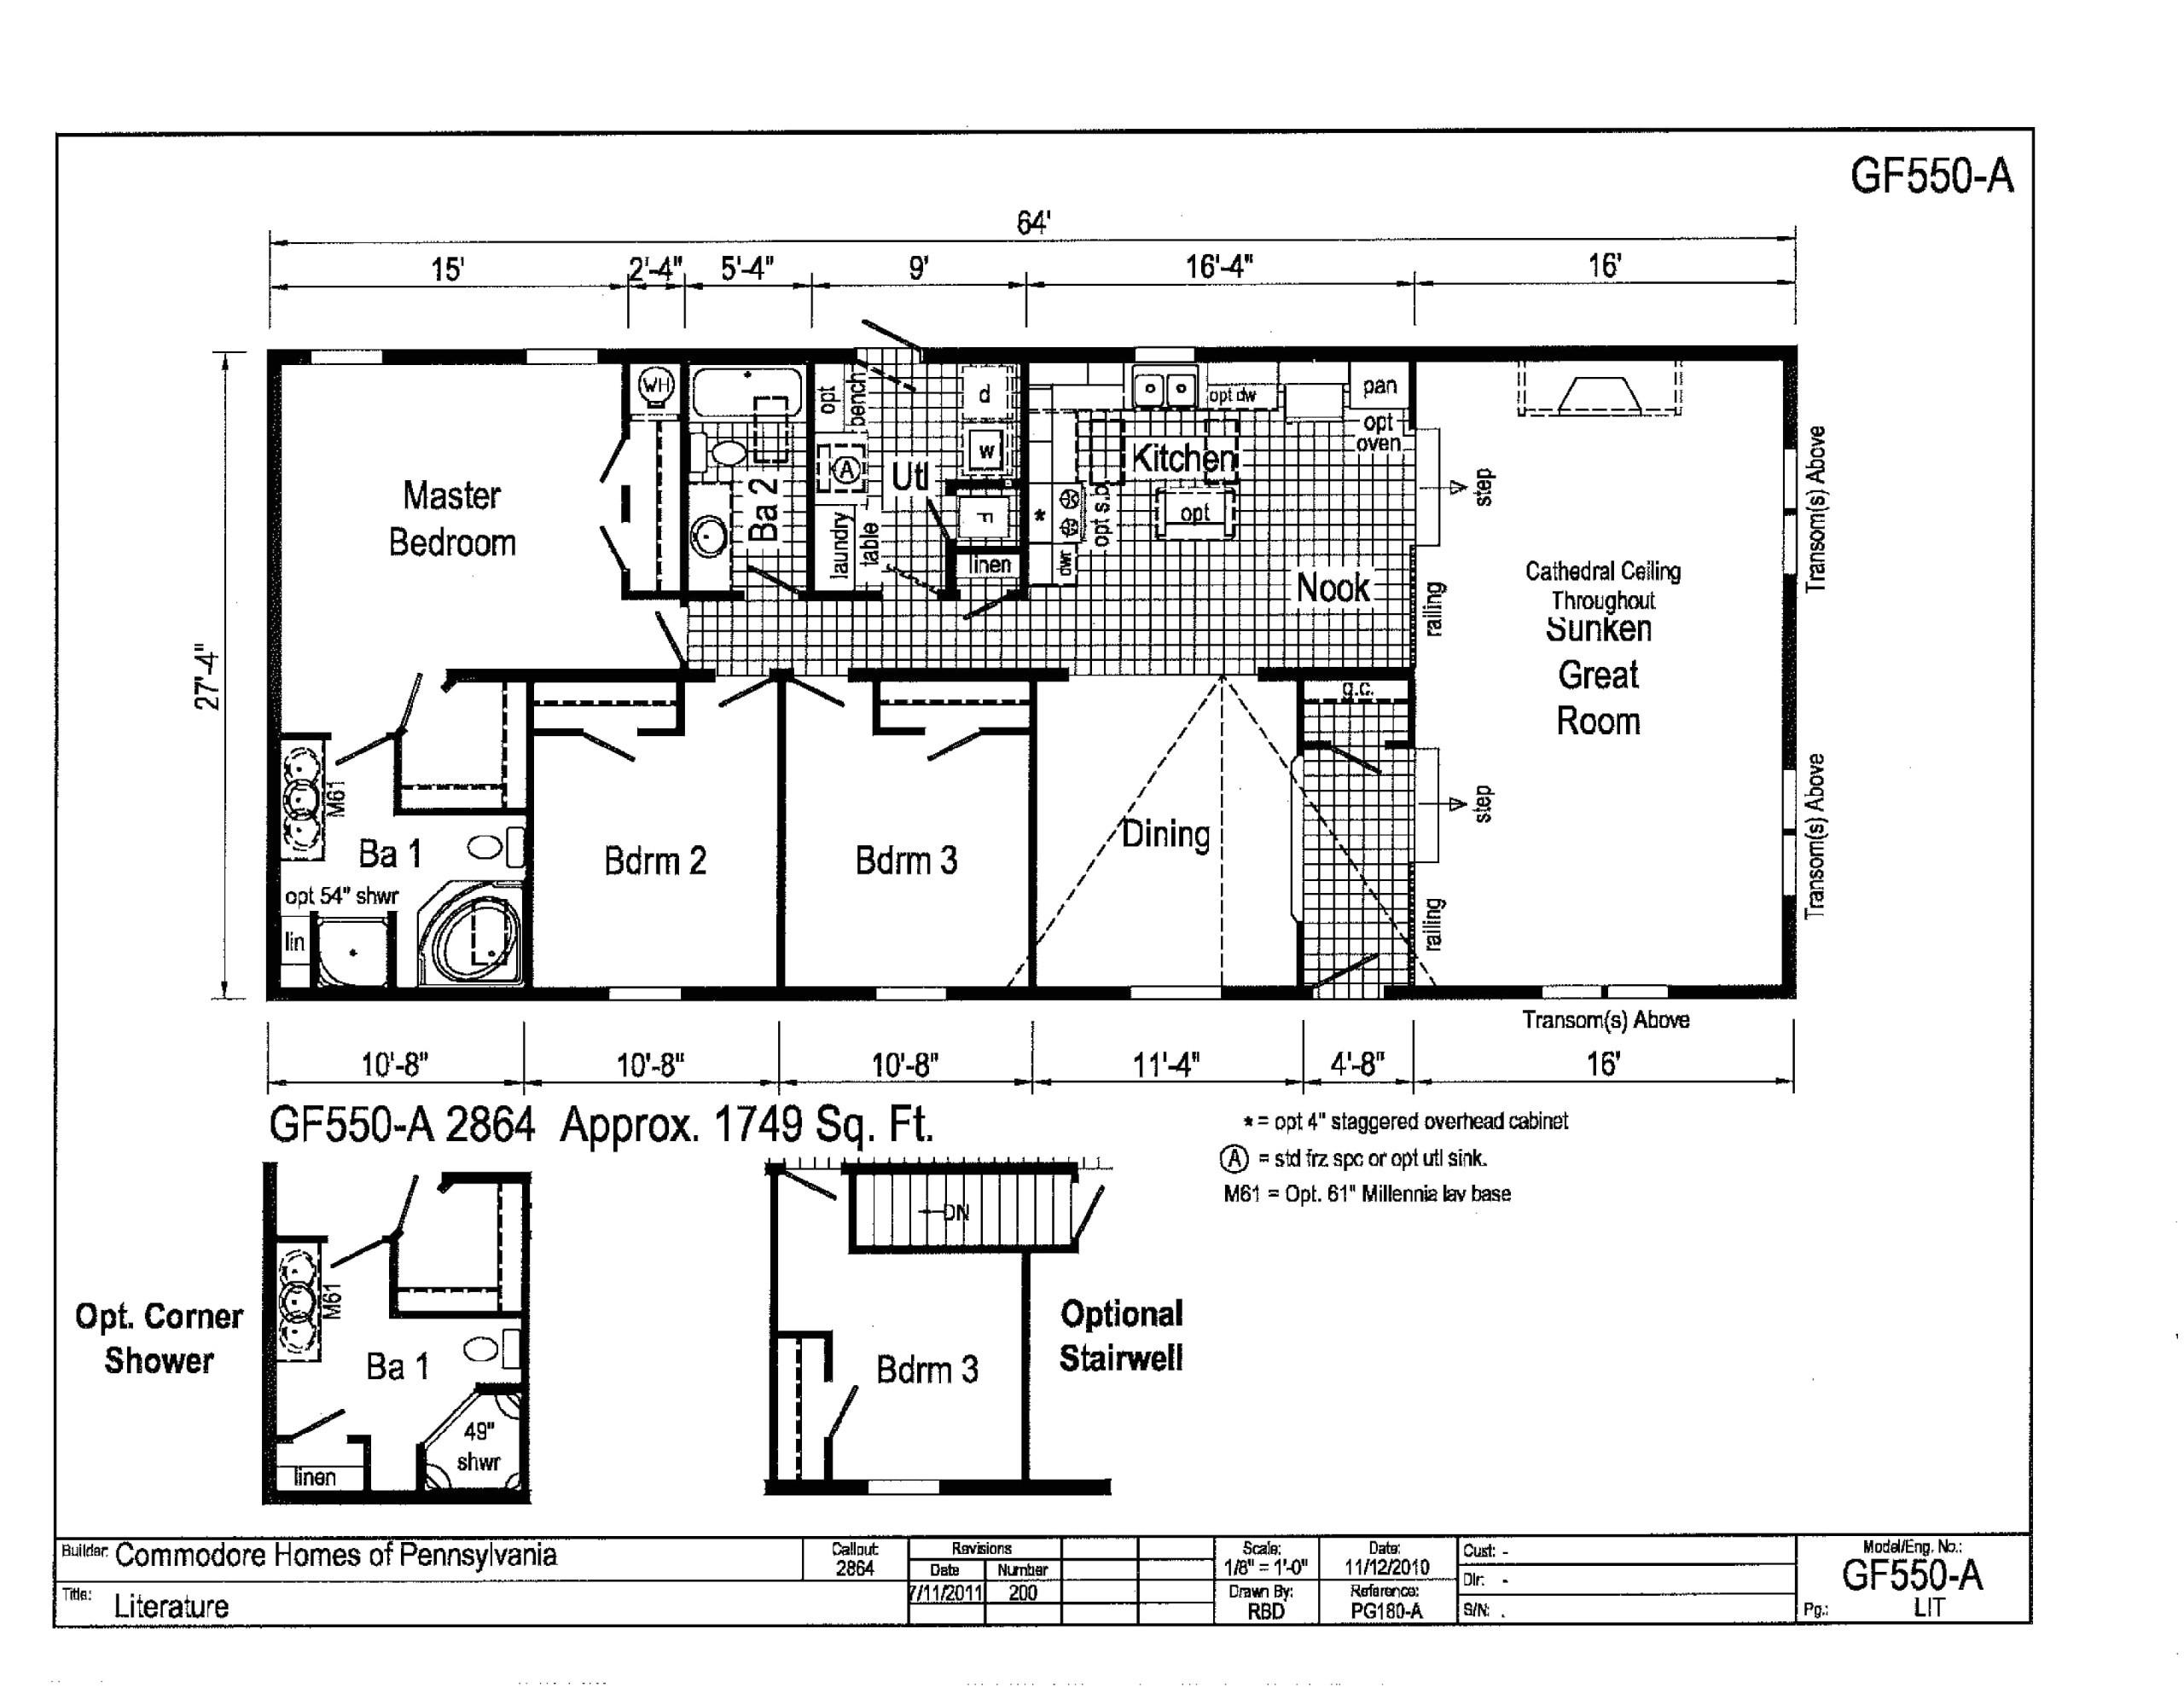 autocad house plans elegant 48 awesome pics villa floor plans pdf of autocad house plans lovely